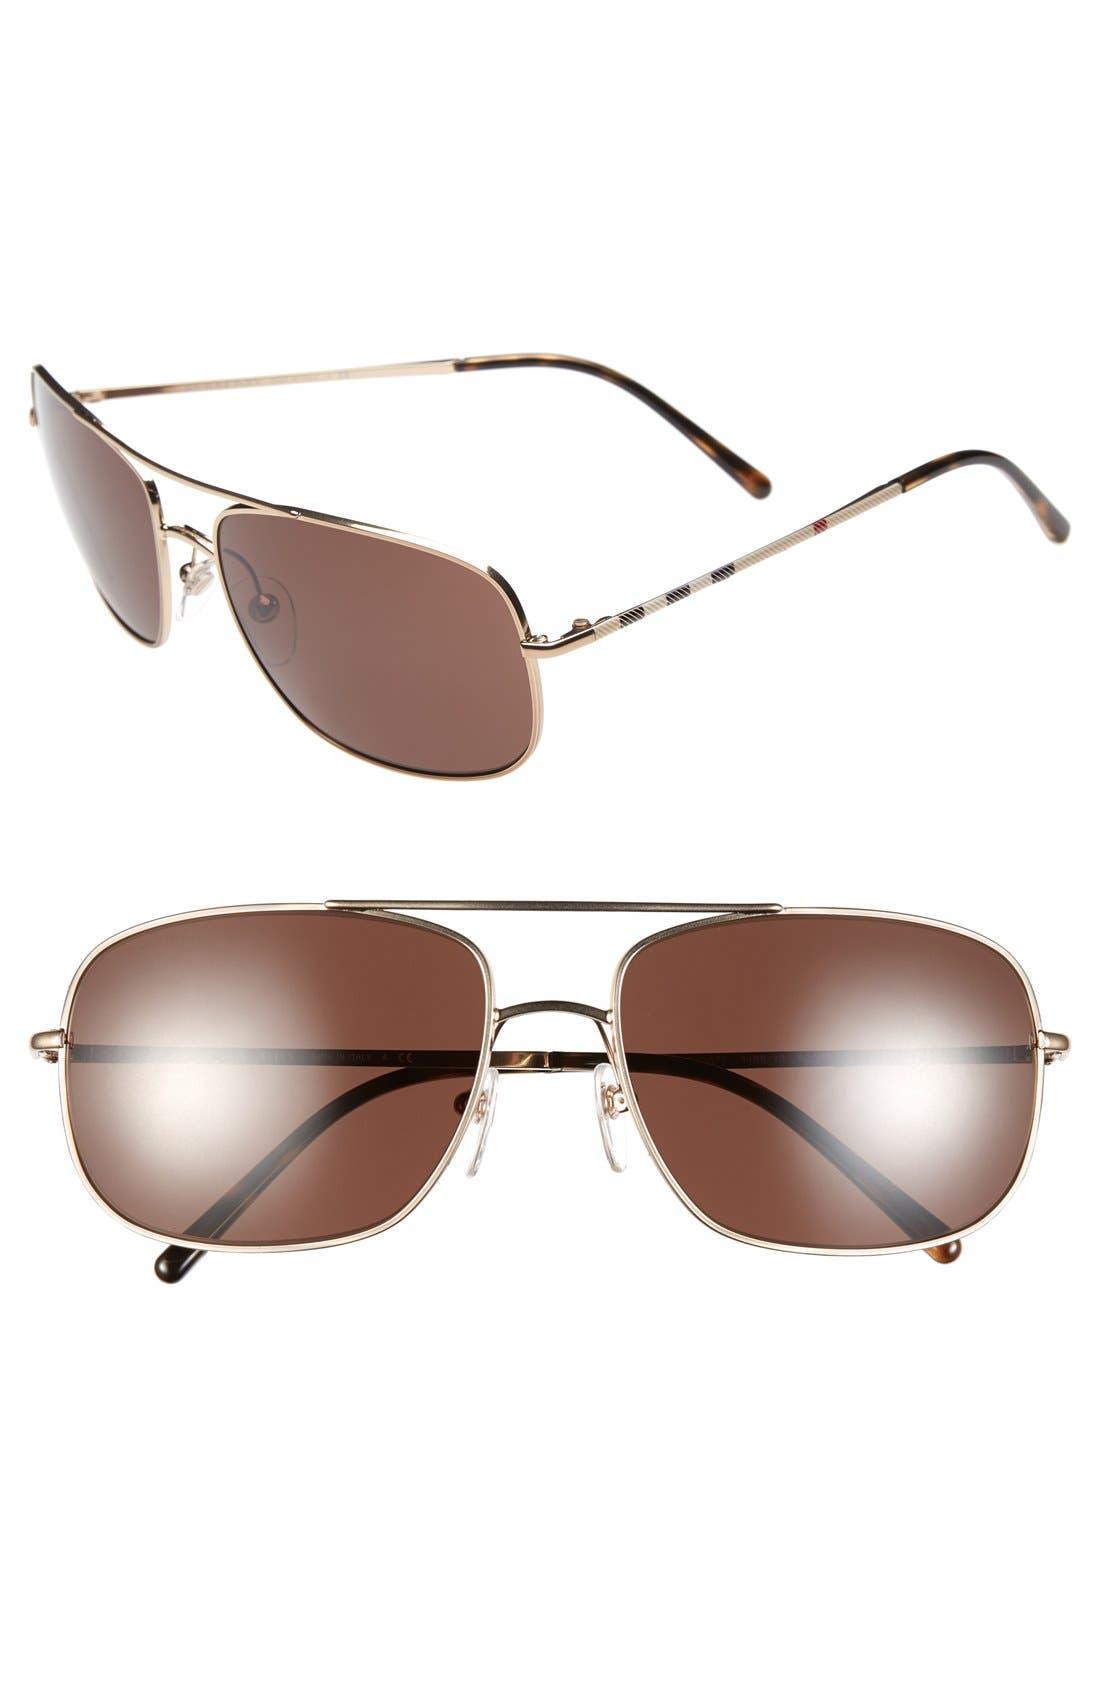 Main Image - Burberry 60mm Aviator Sunglasses